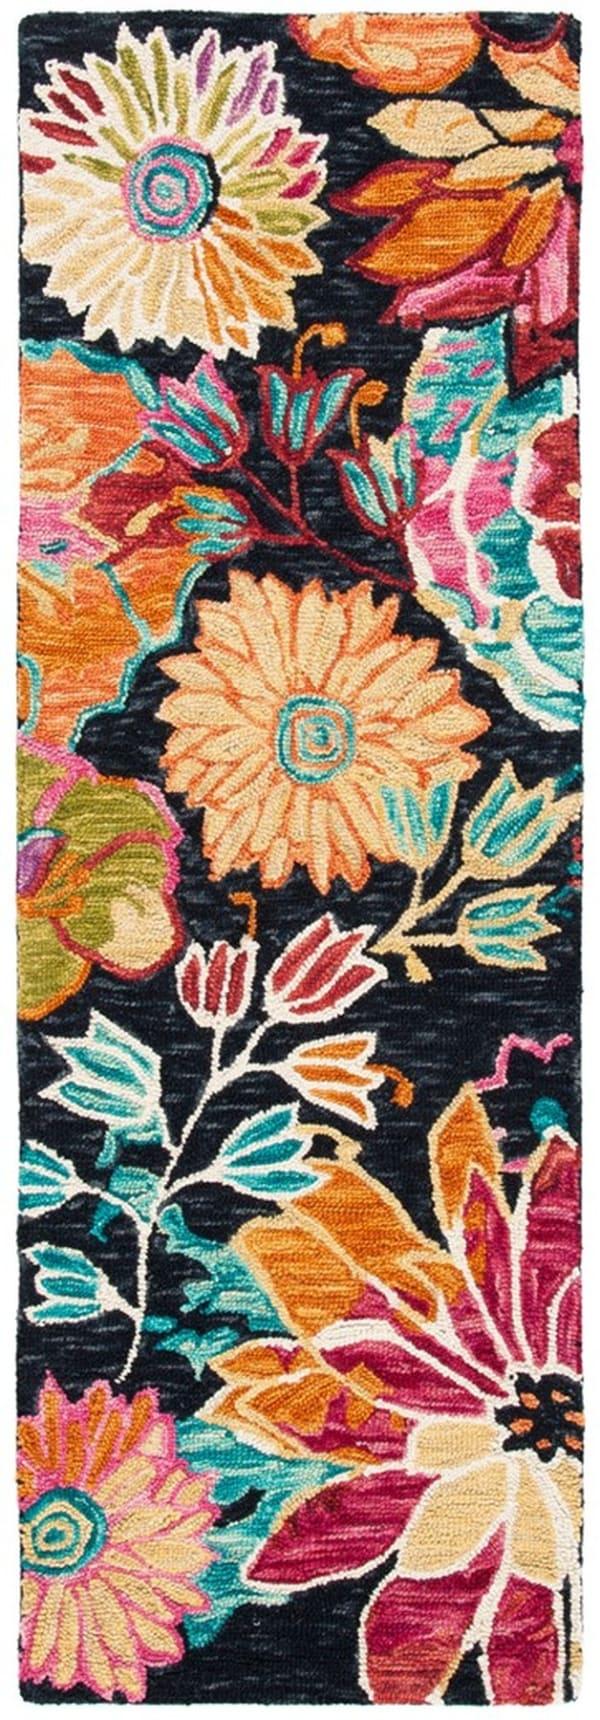 Safavieh Vail Black & Blue Wool Rug